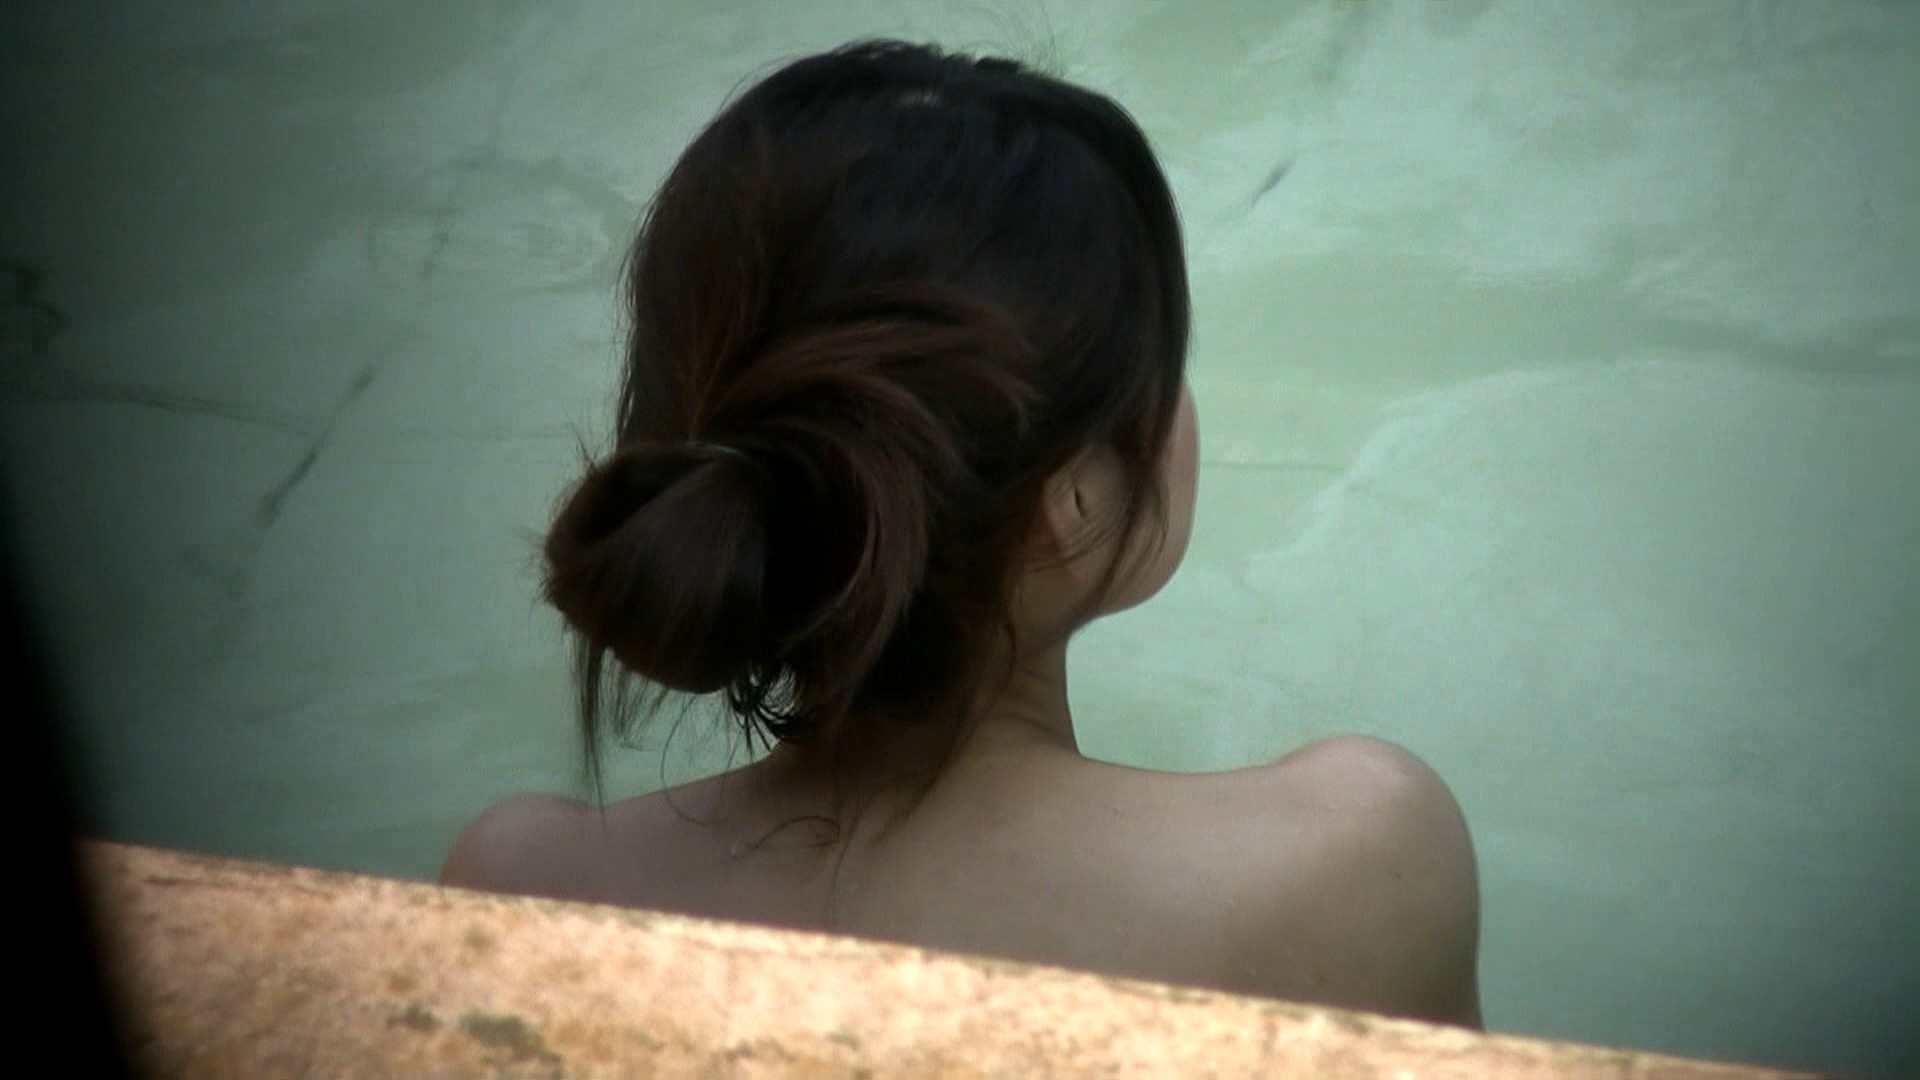 Aquaな露天風呂Vol.652 盗撮 | HなOL  105pic 98